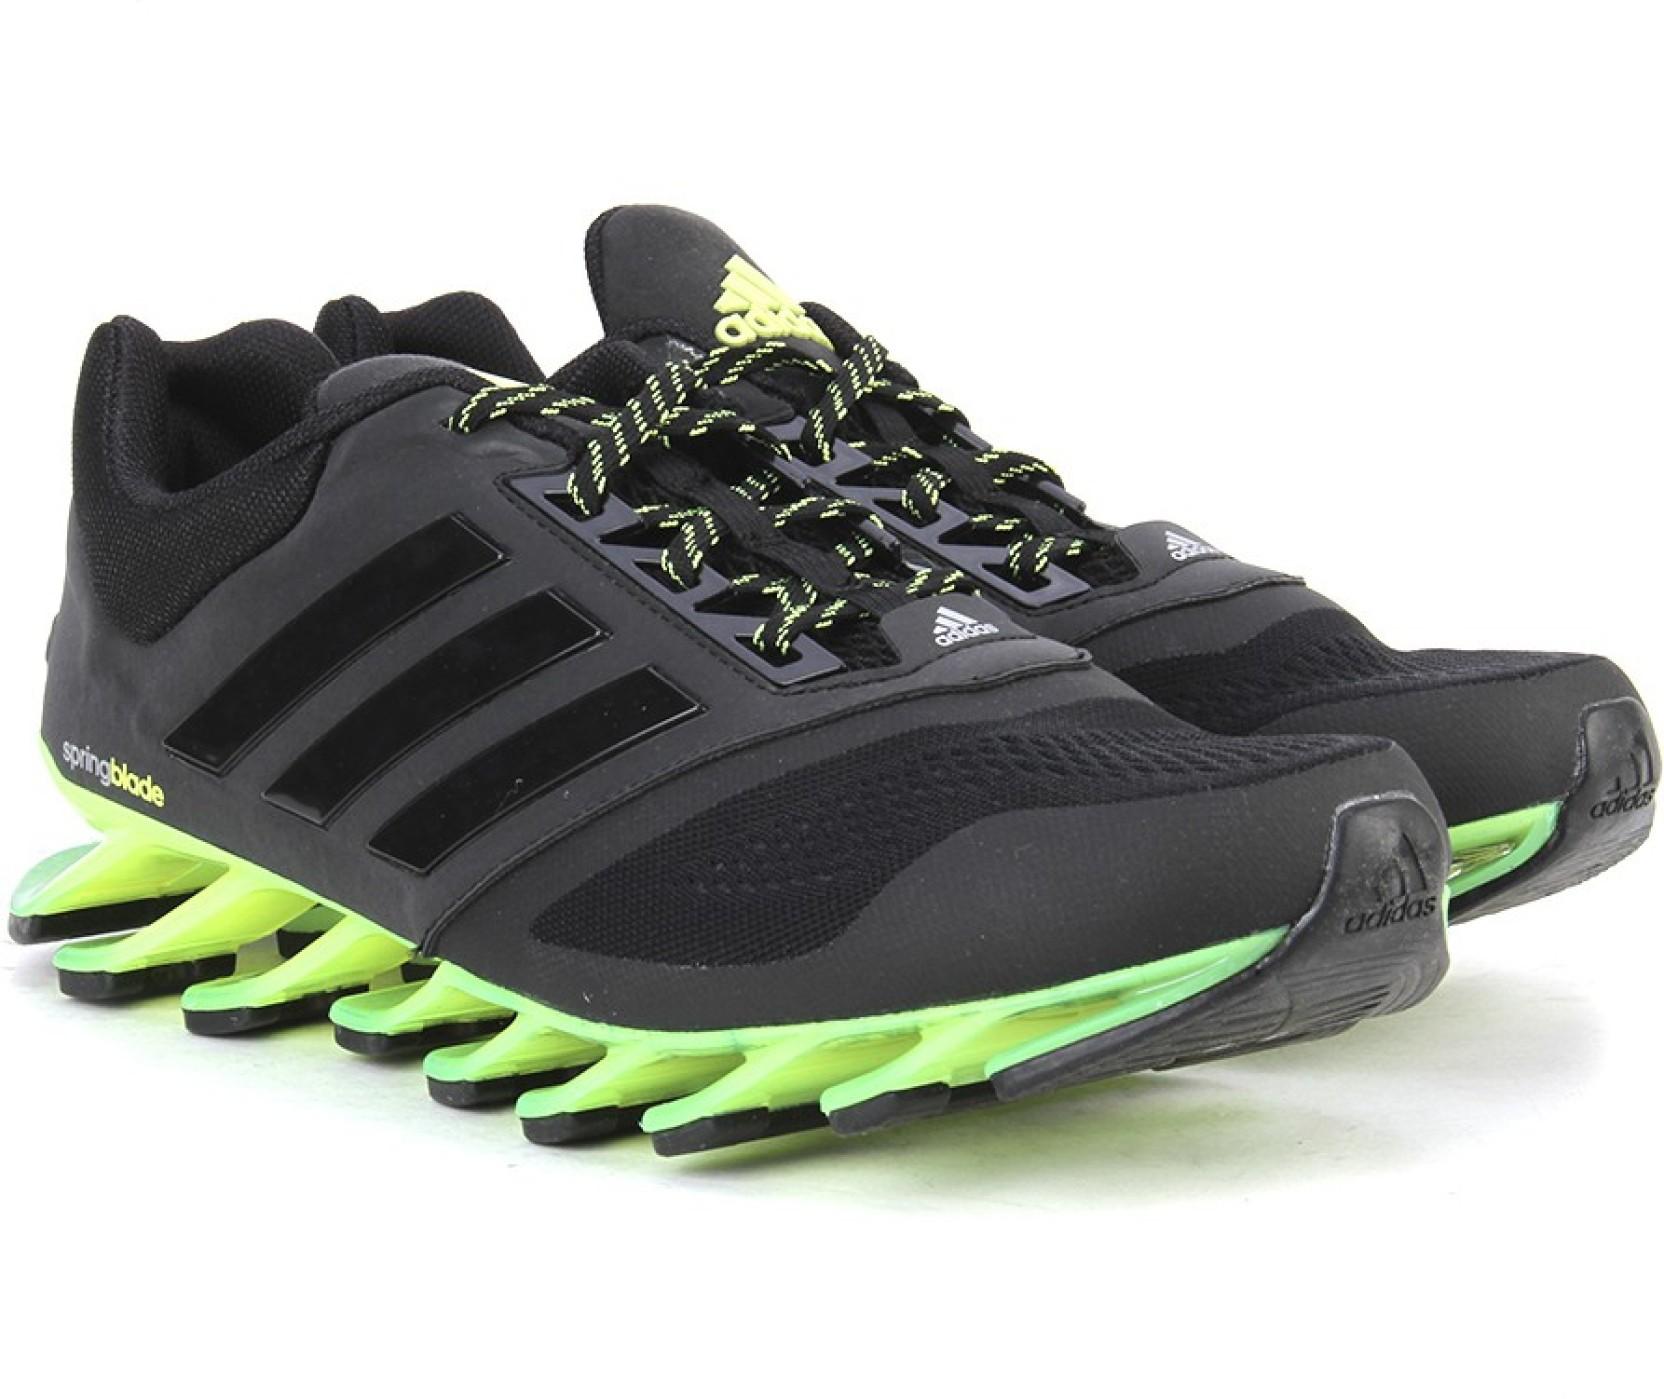 ADIDAS SPRINGBLADE DRIVE 2 M Running Shoes For Men - Buy CBLACK ... 00264db4e